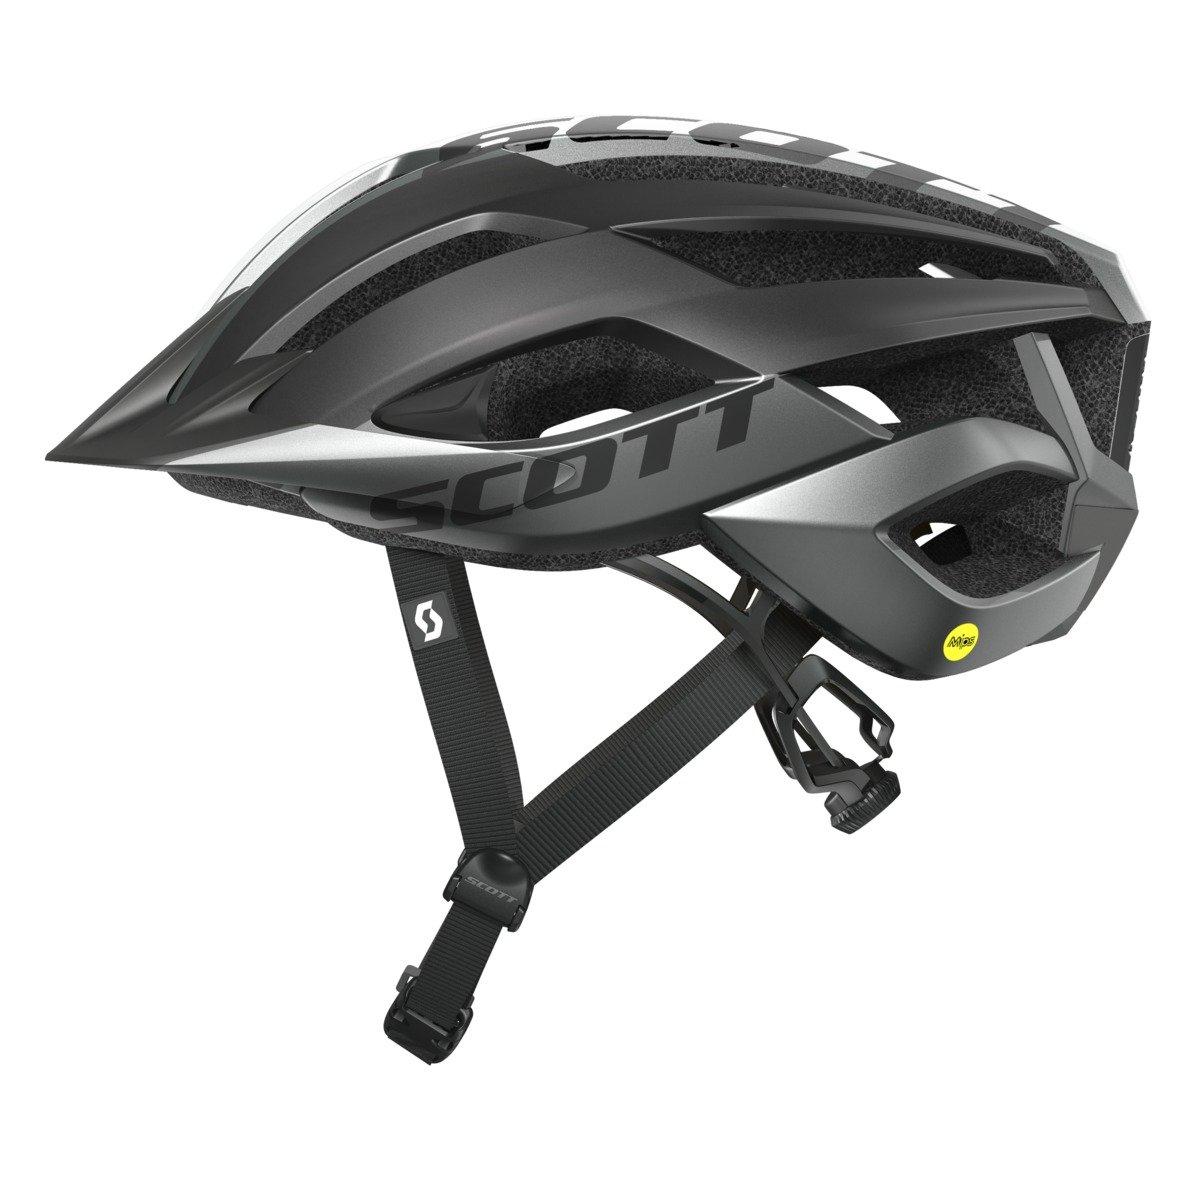 Radsport Helmzubehör L Scott Vivo Plus Helmet White/Black